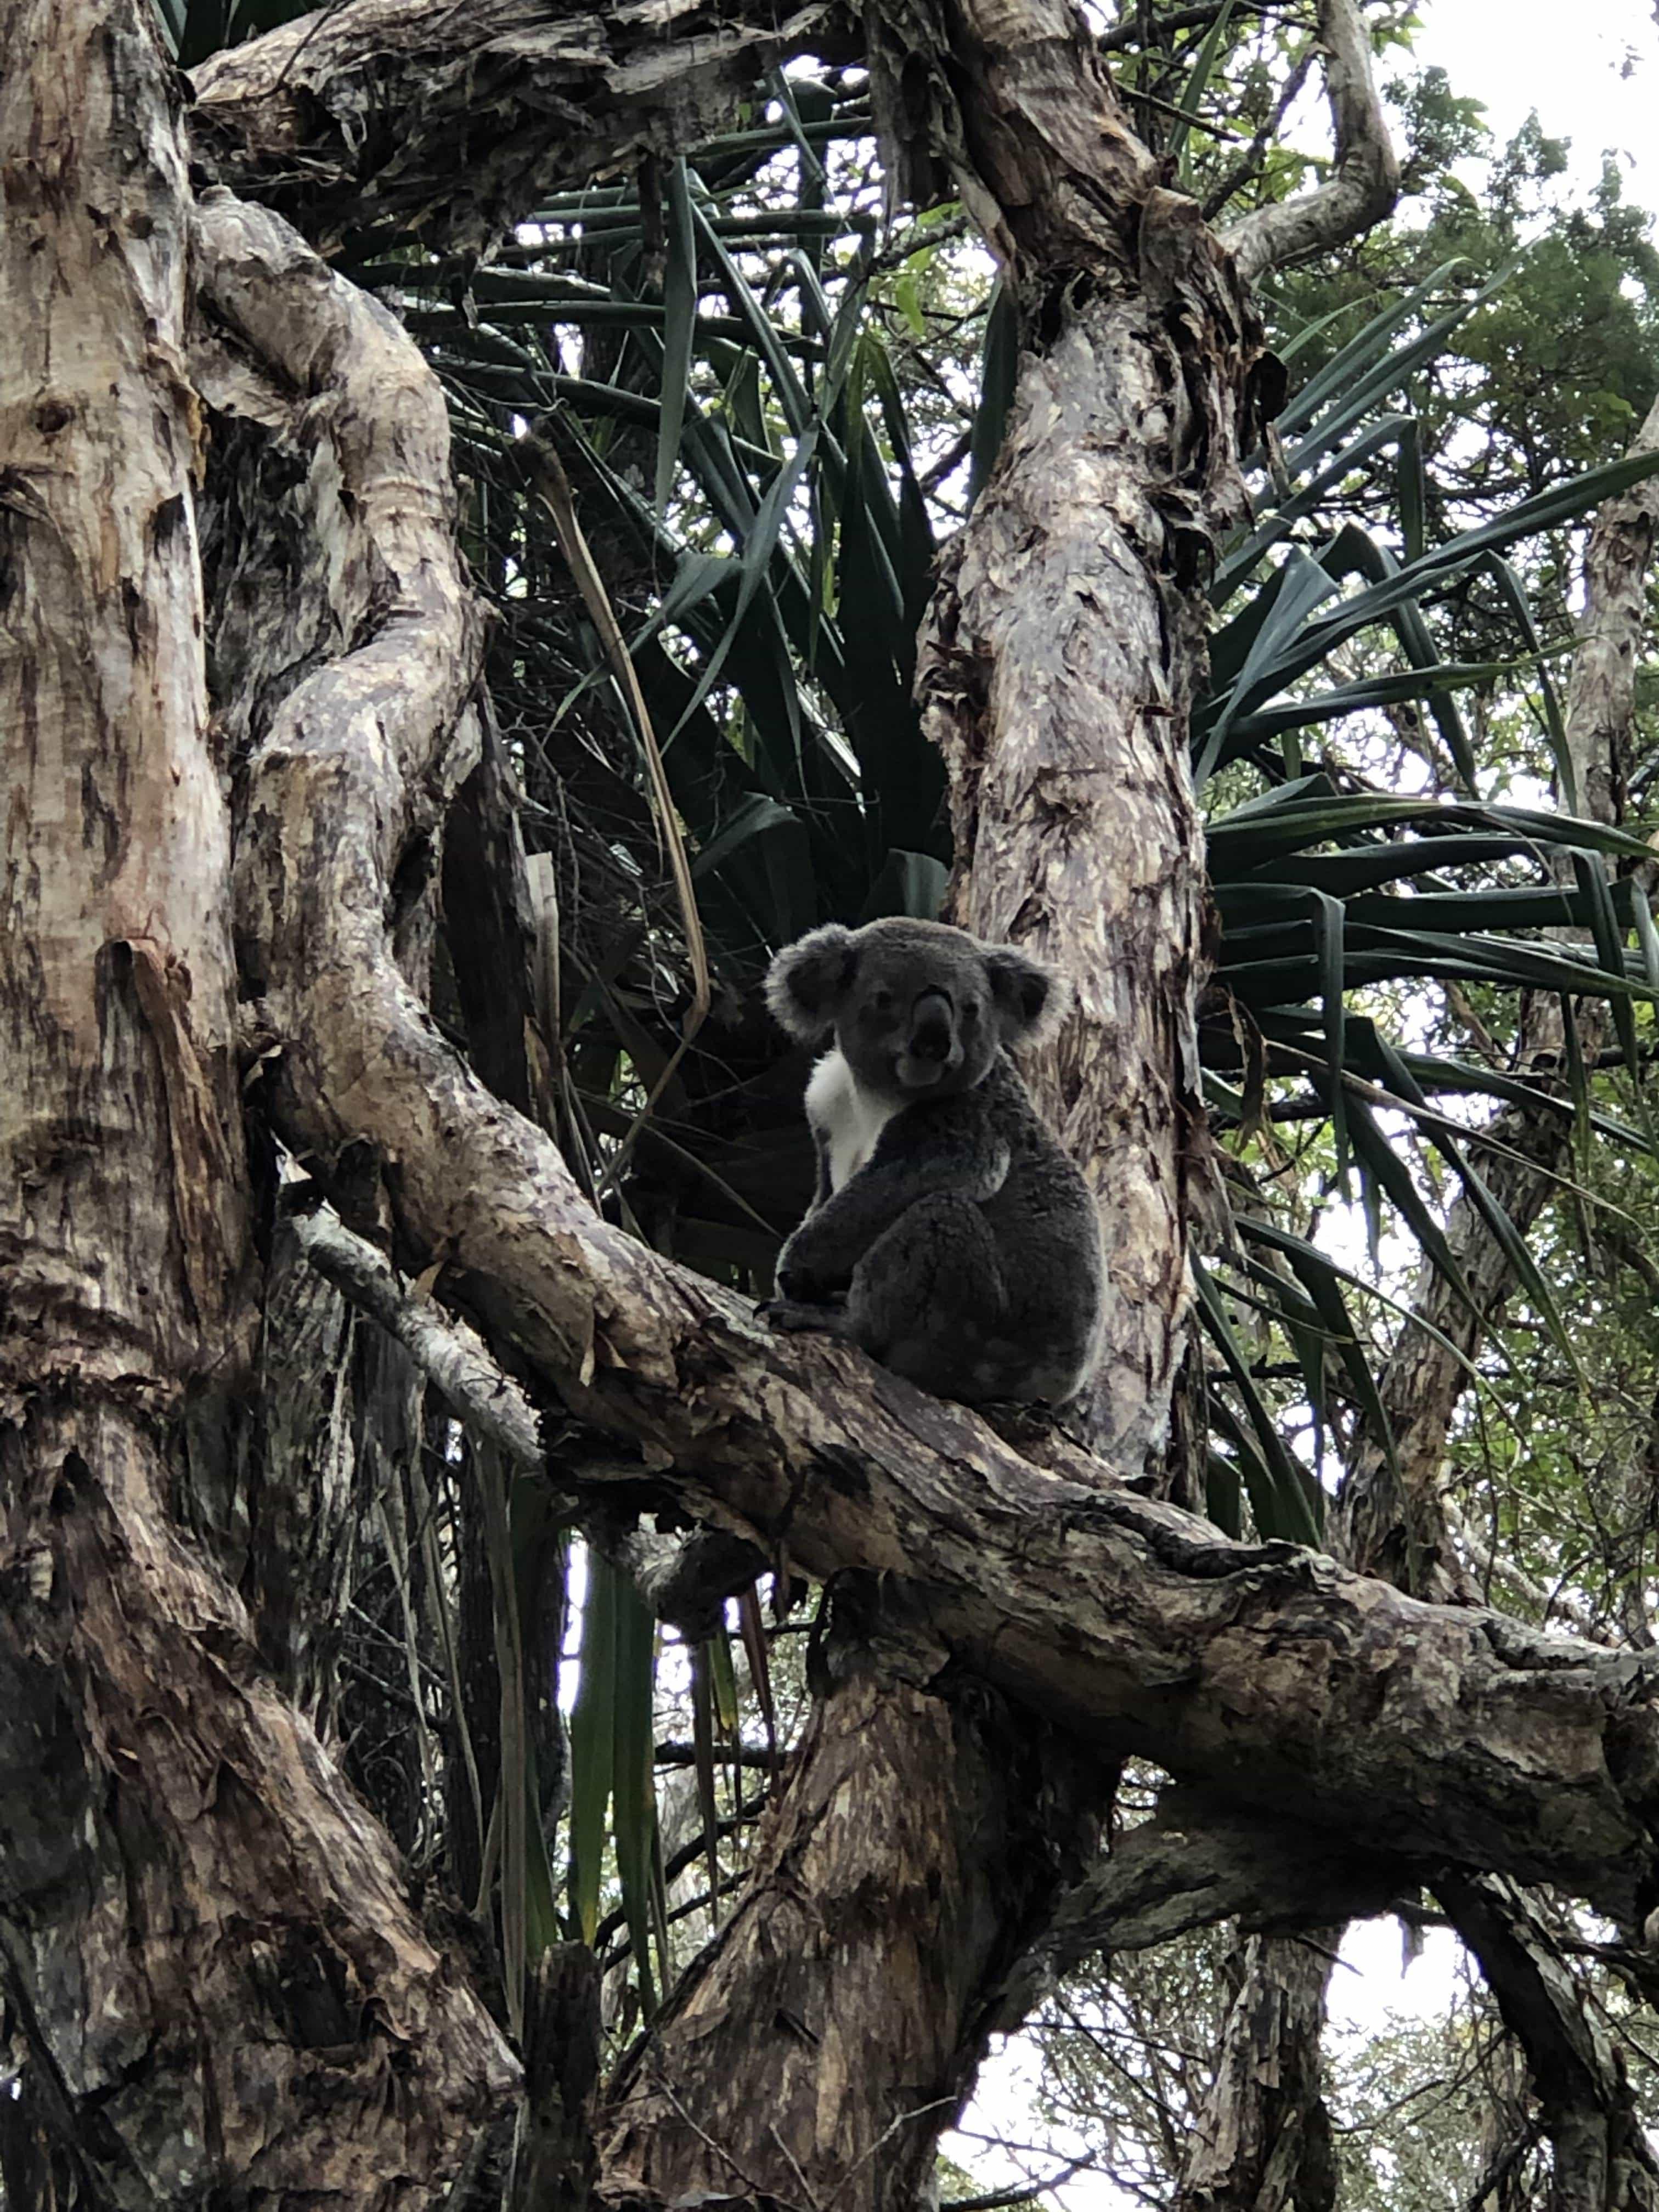 Koala in the wild!